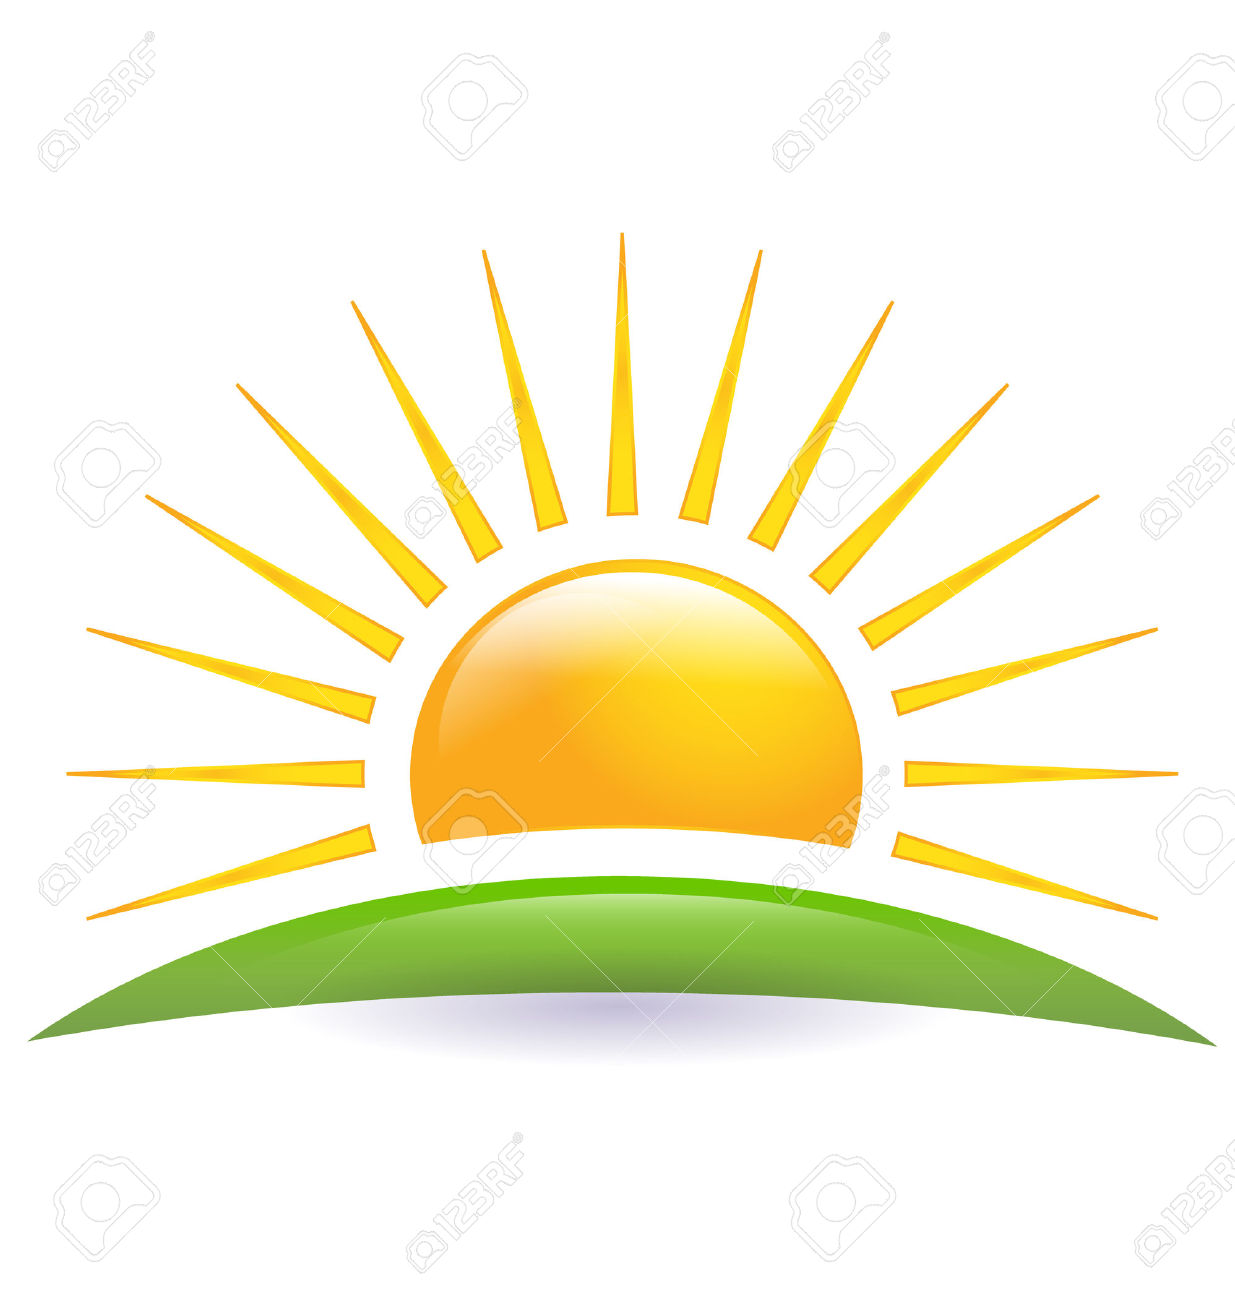 sun logo clipart clipground